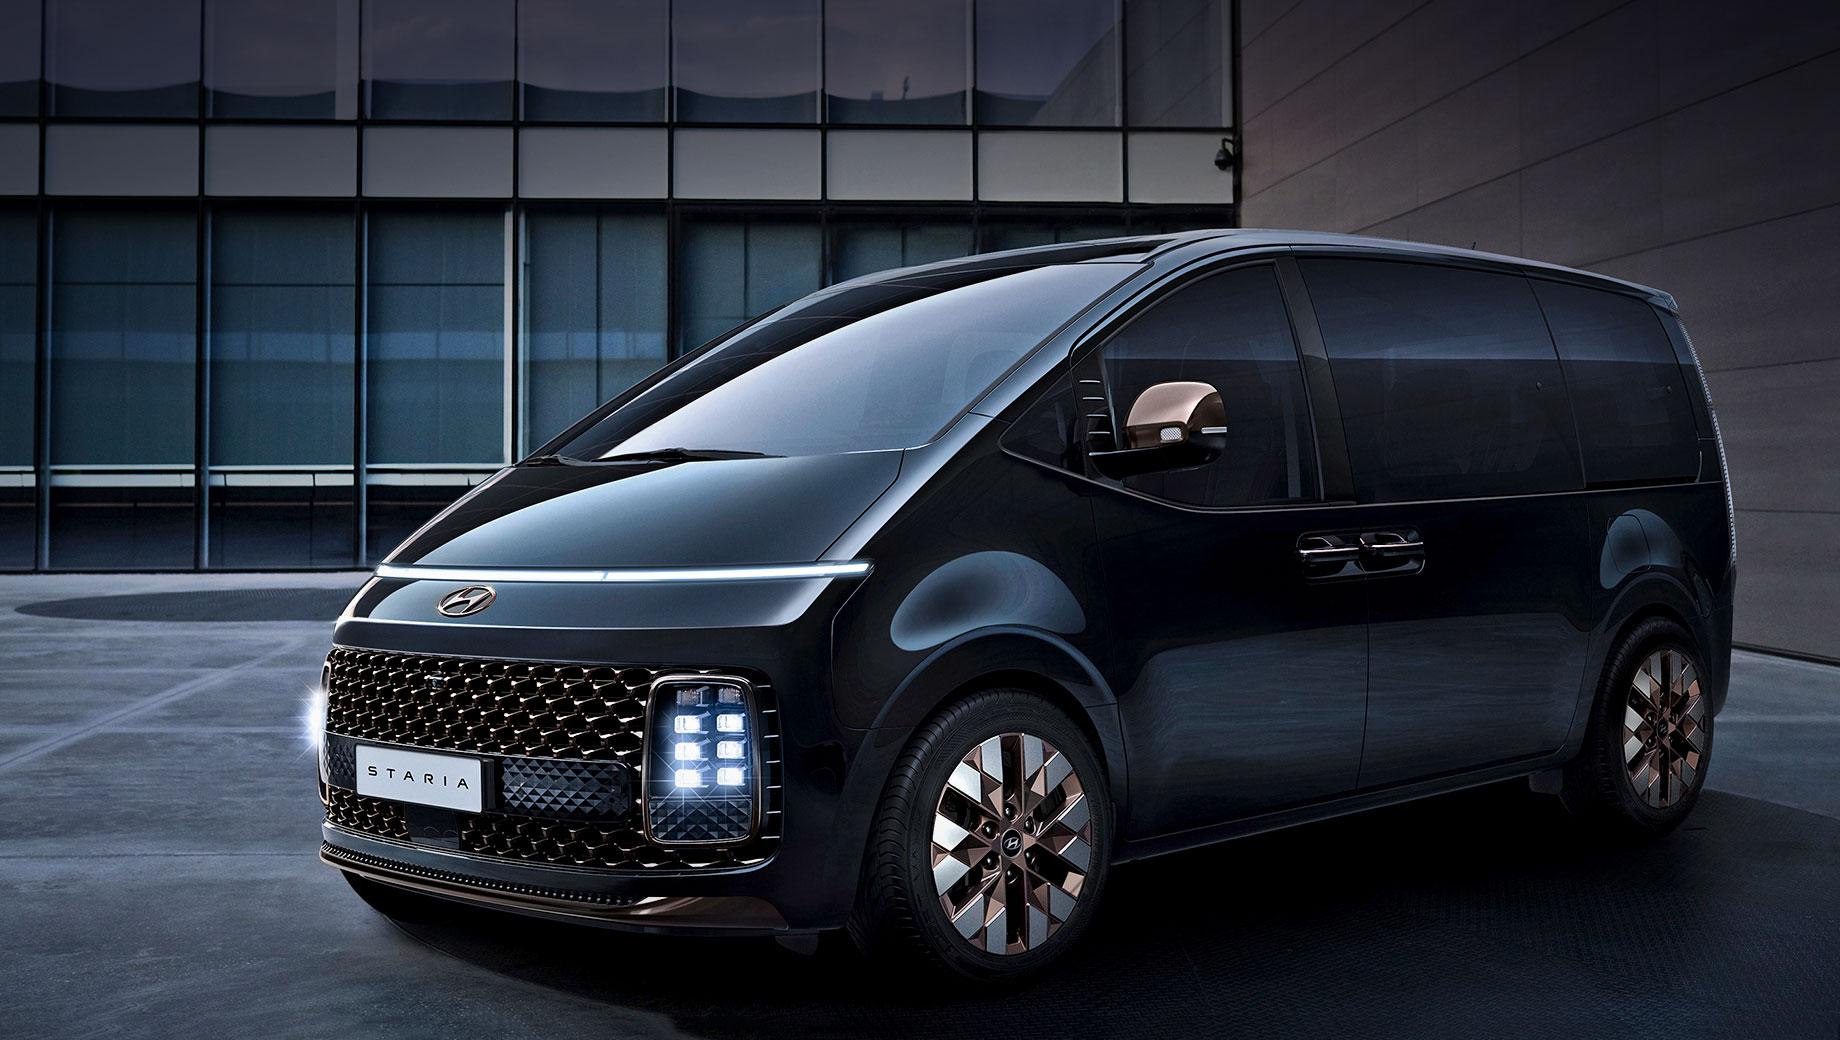 Hyundai Staria получит салон на 11 посадочных мест